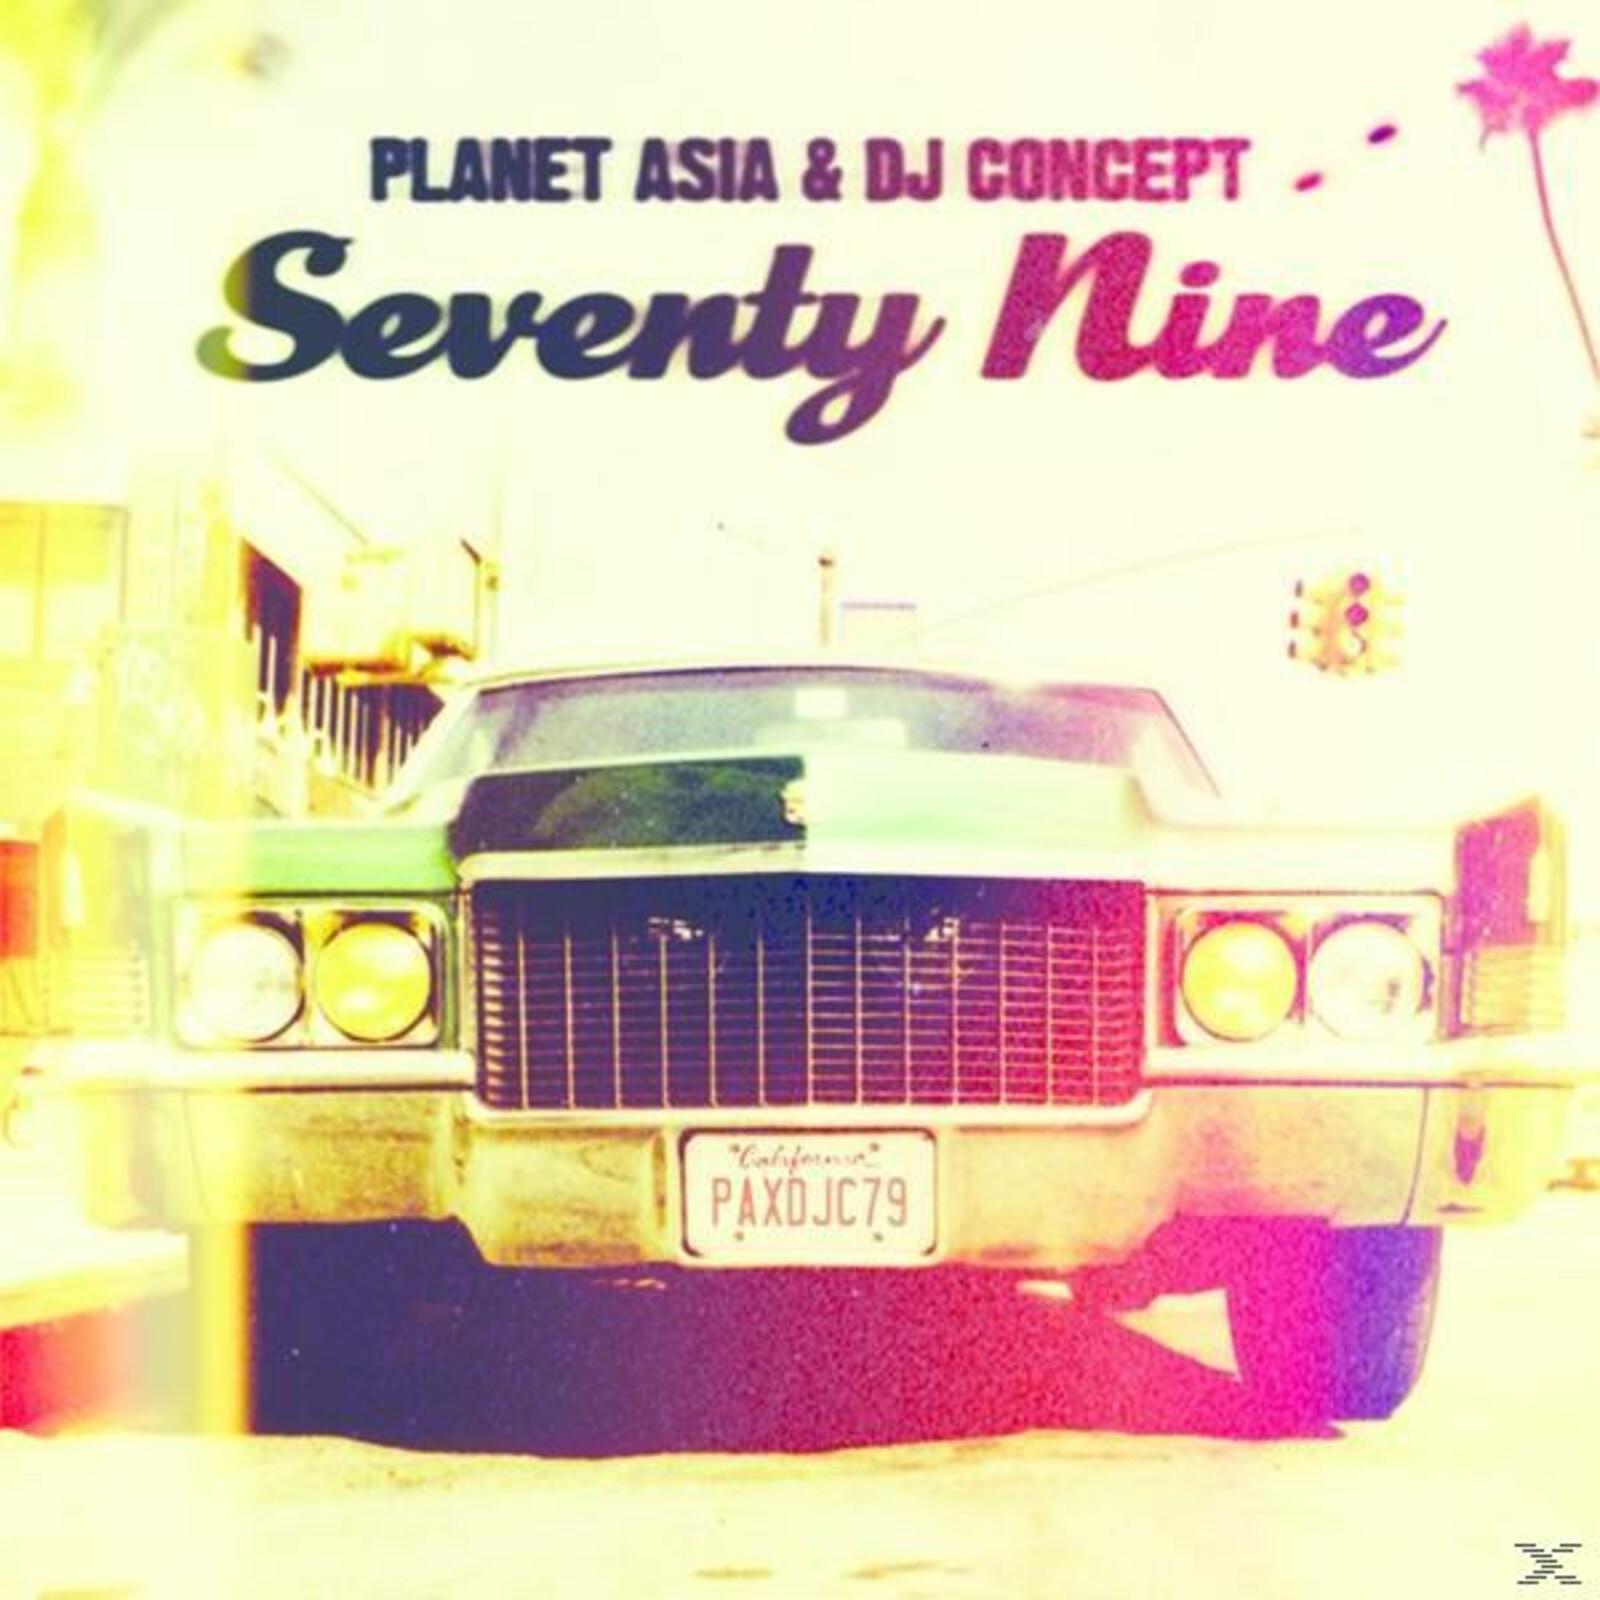 Planet Asia & Dj Concept - Seventy Nine [CD]